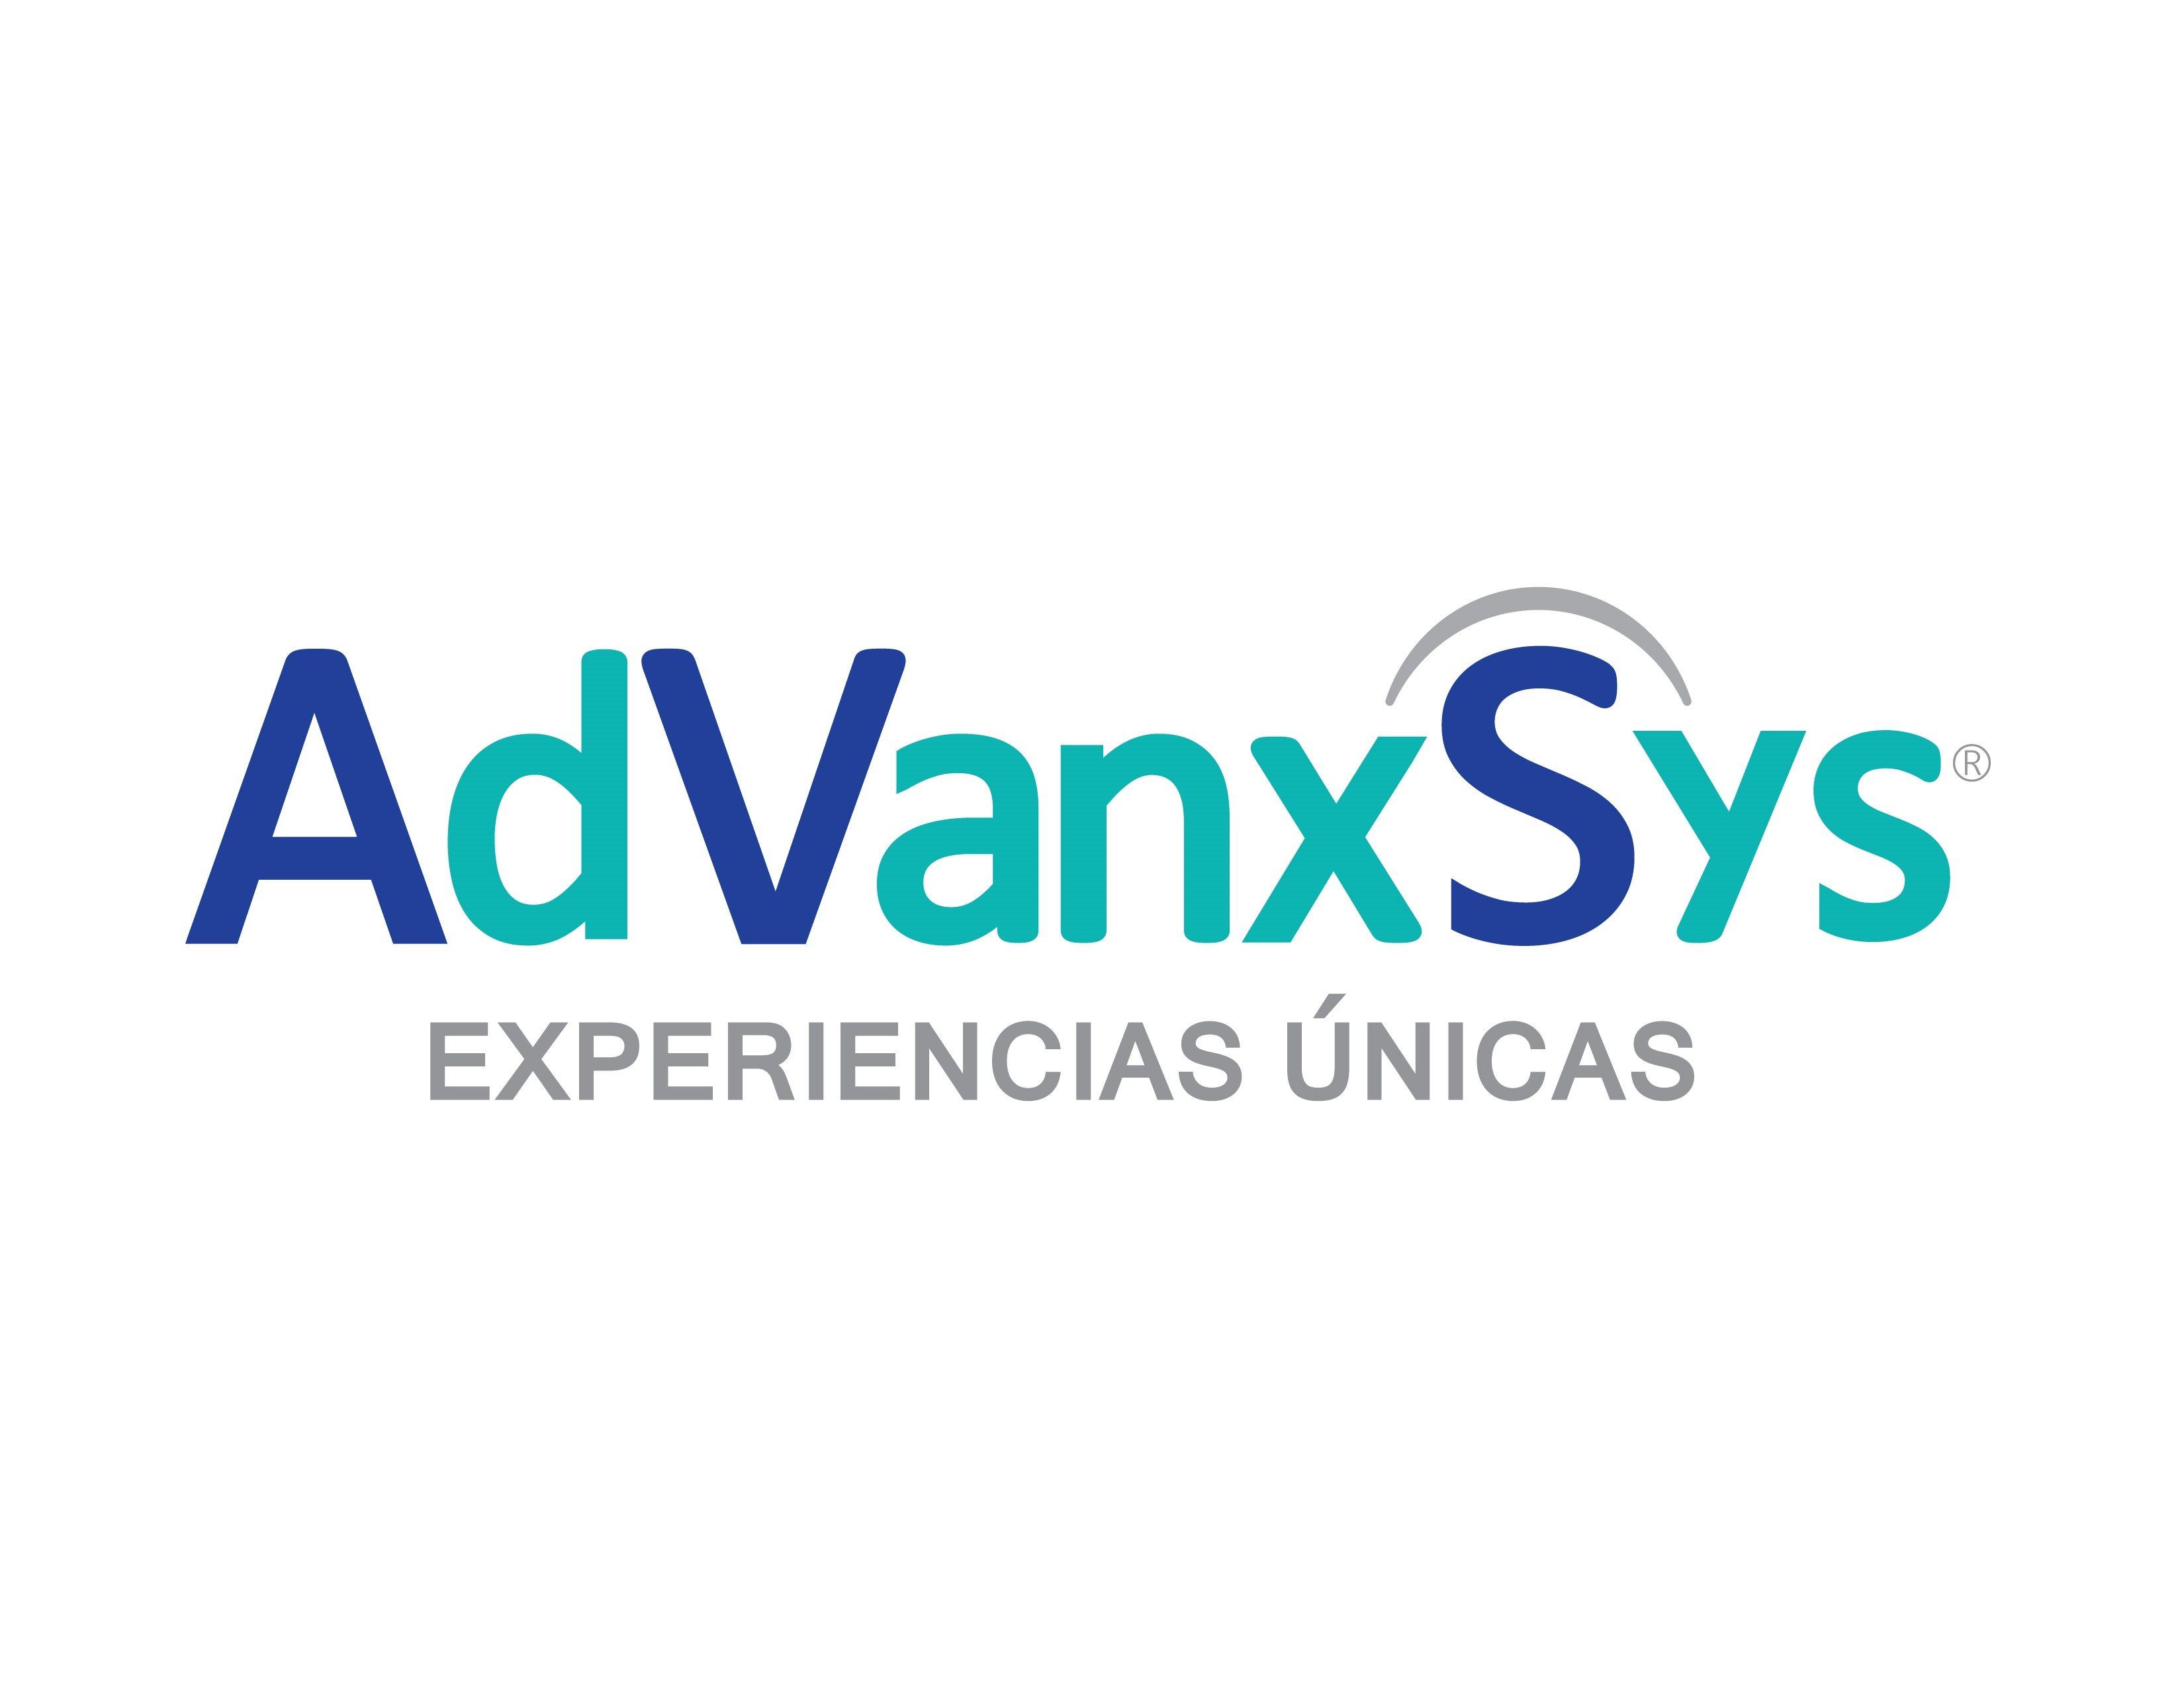 ADVANXSYS